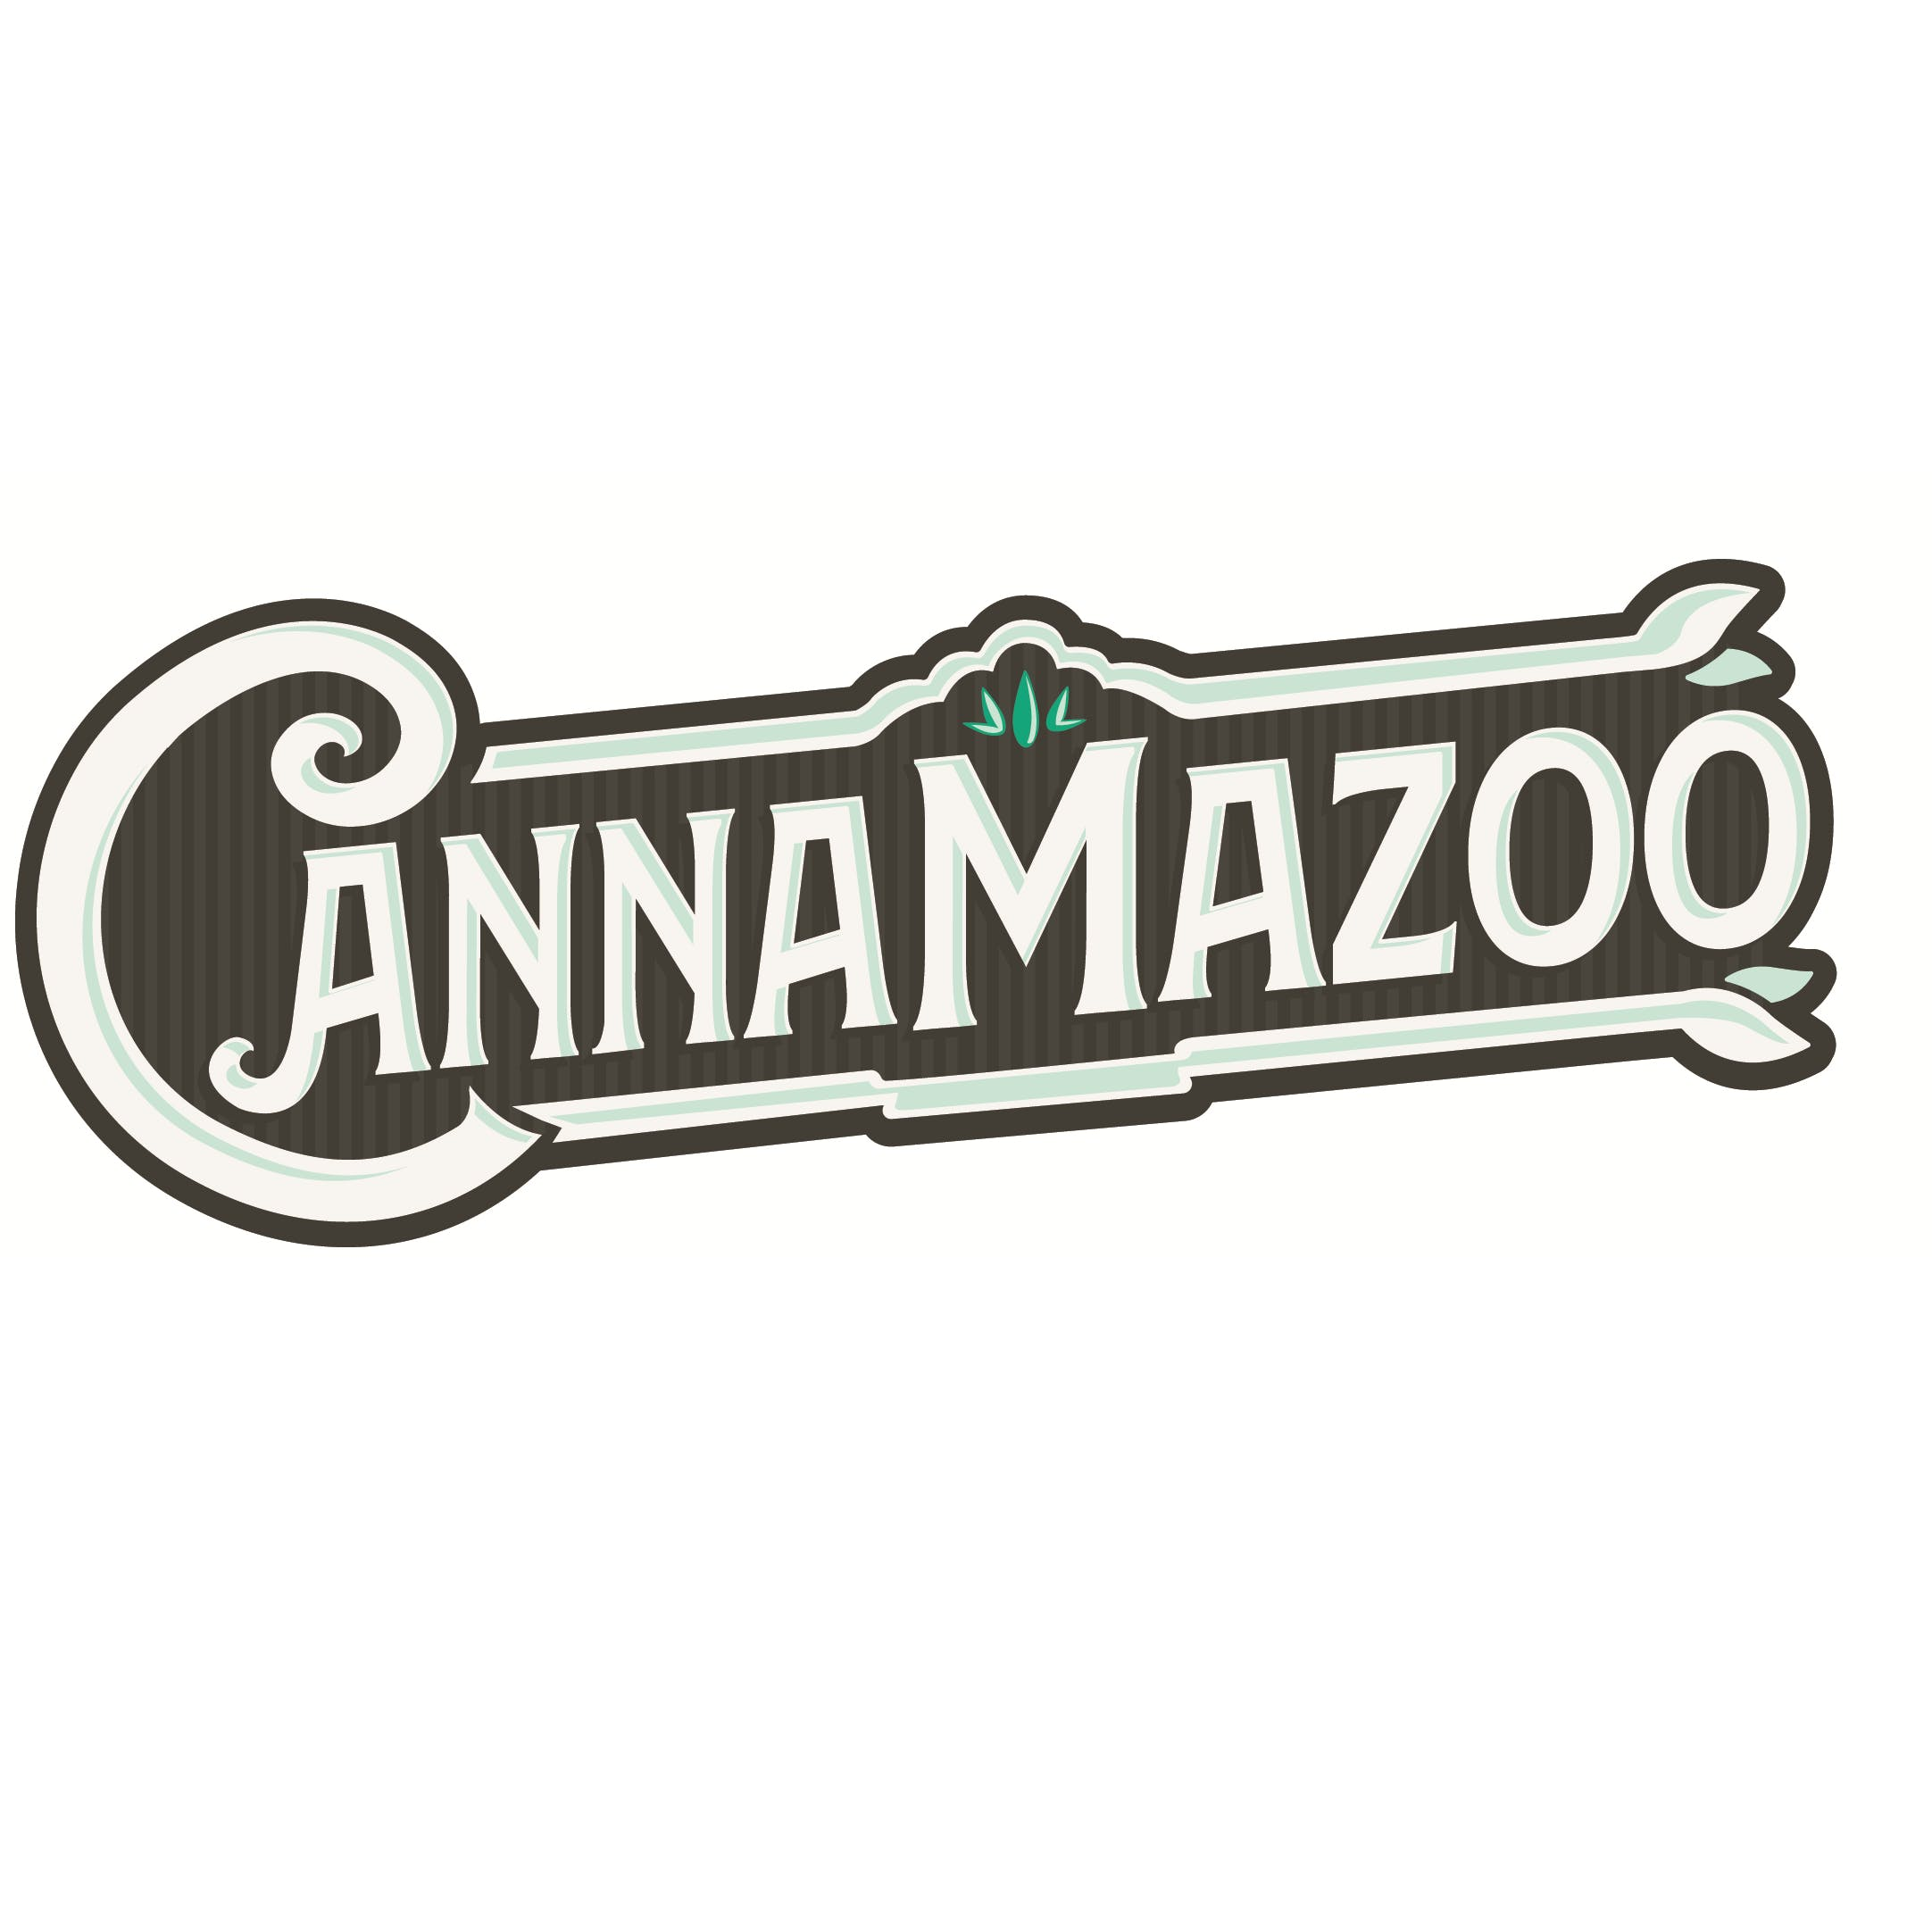 Cannamazoo   Store